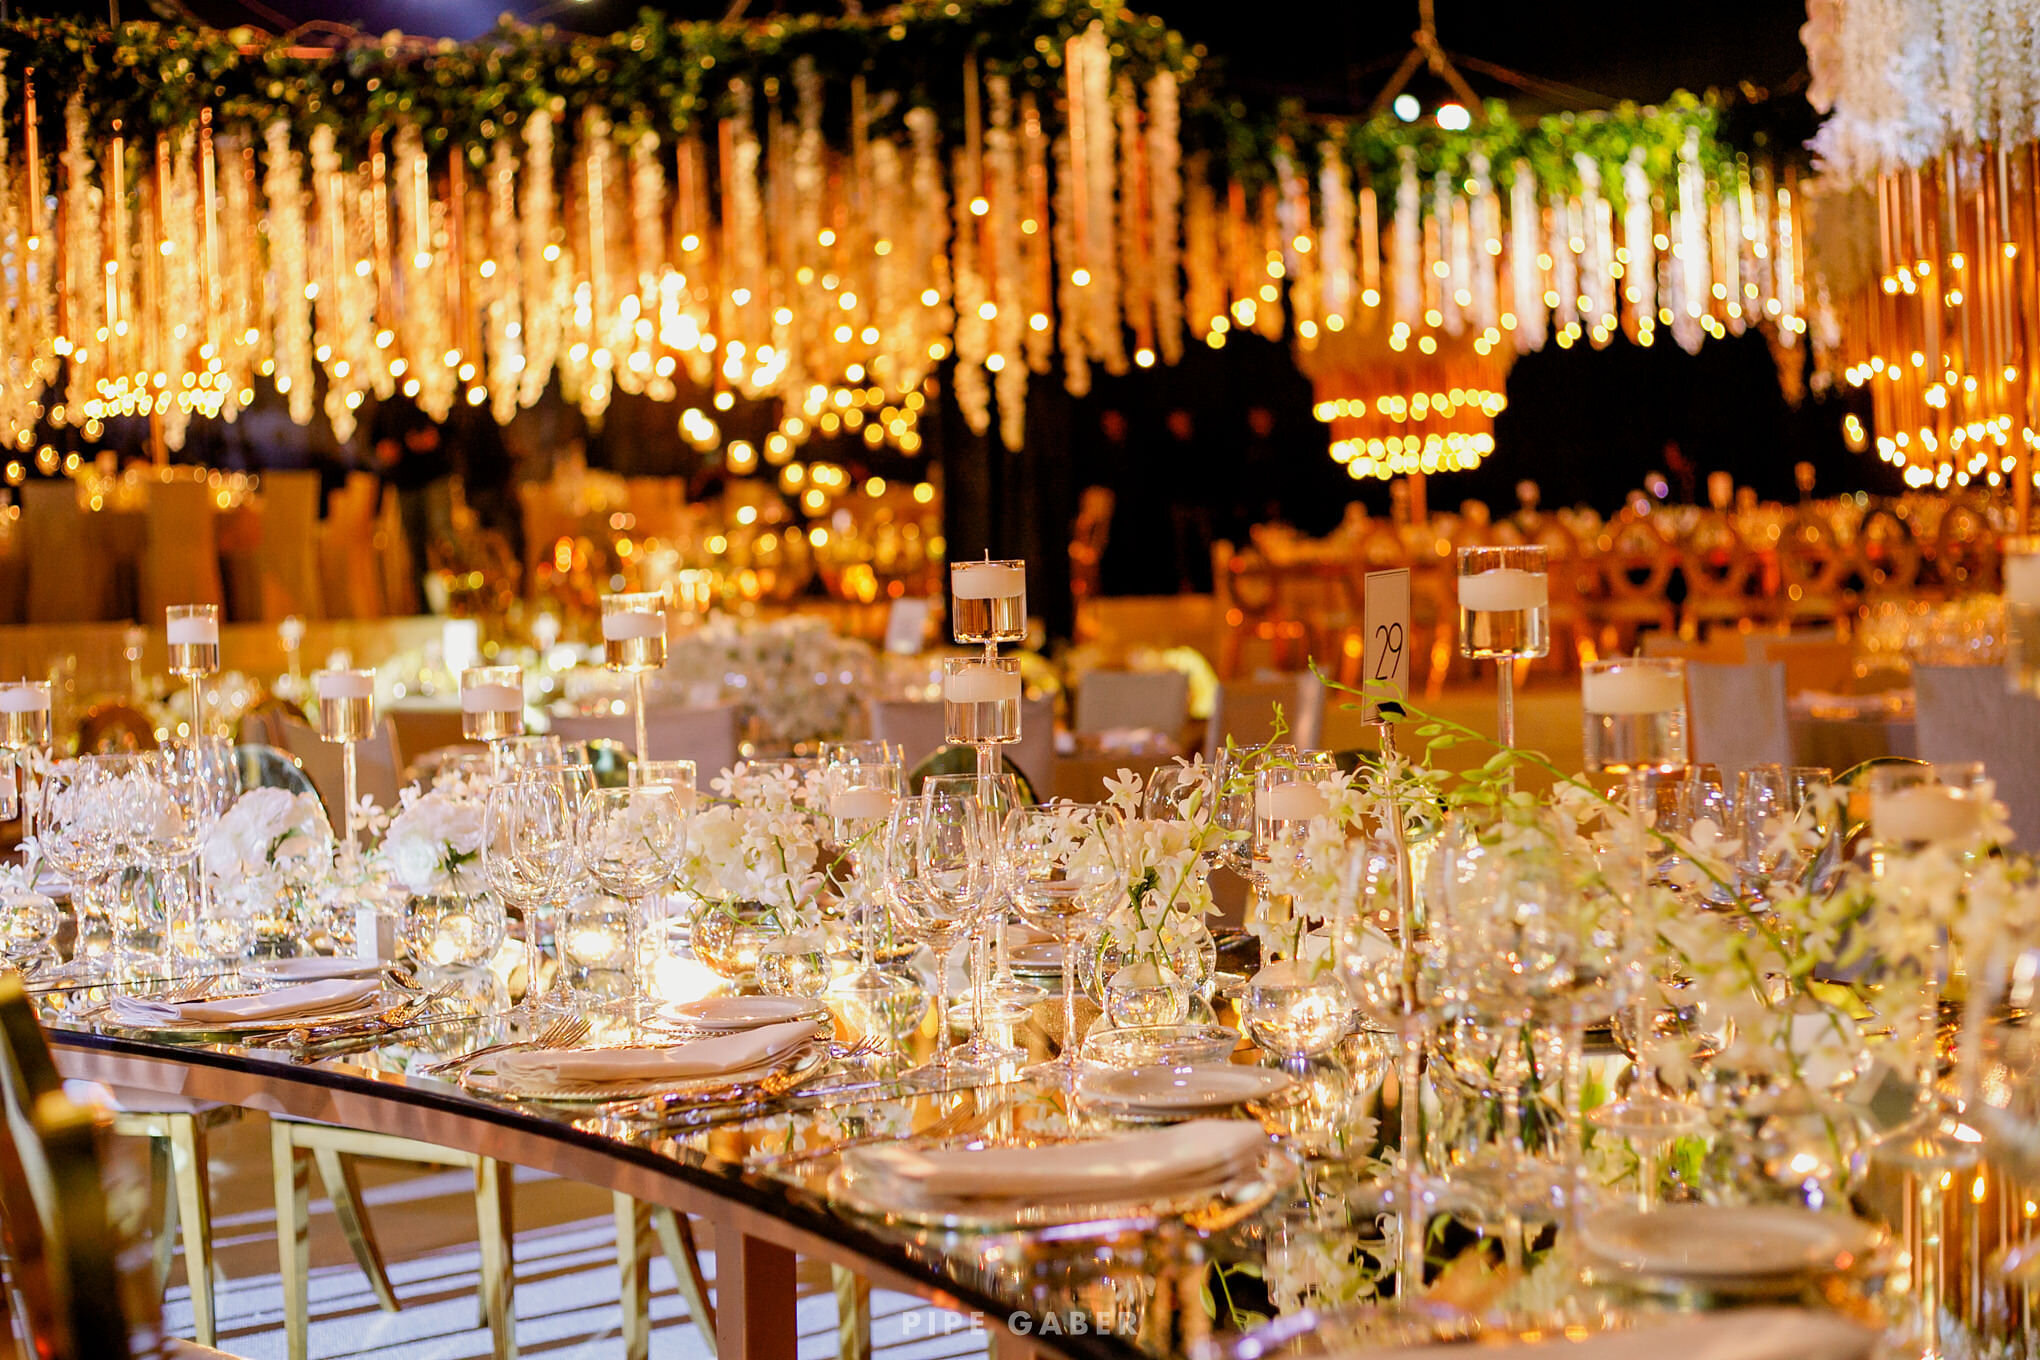 19_08_24_WEDDING_CDMX_STEPHANIE_SAID_&_ANGEL_070_PIXI.jpg